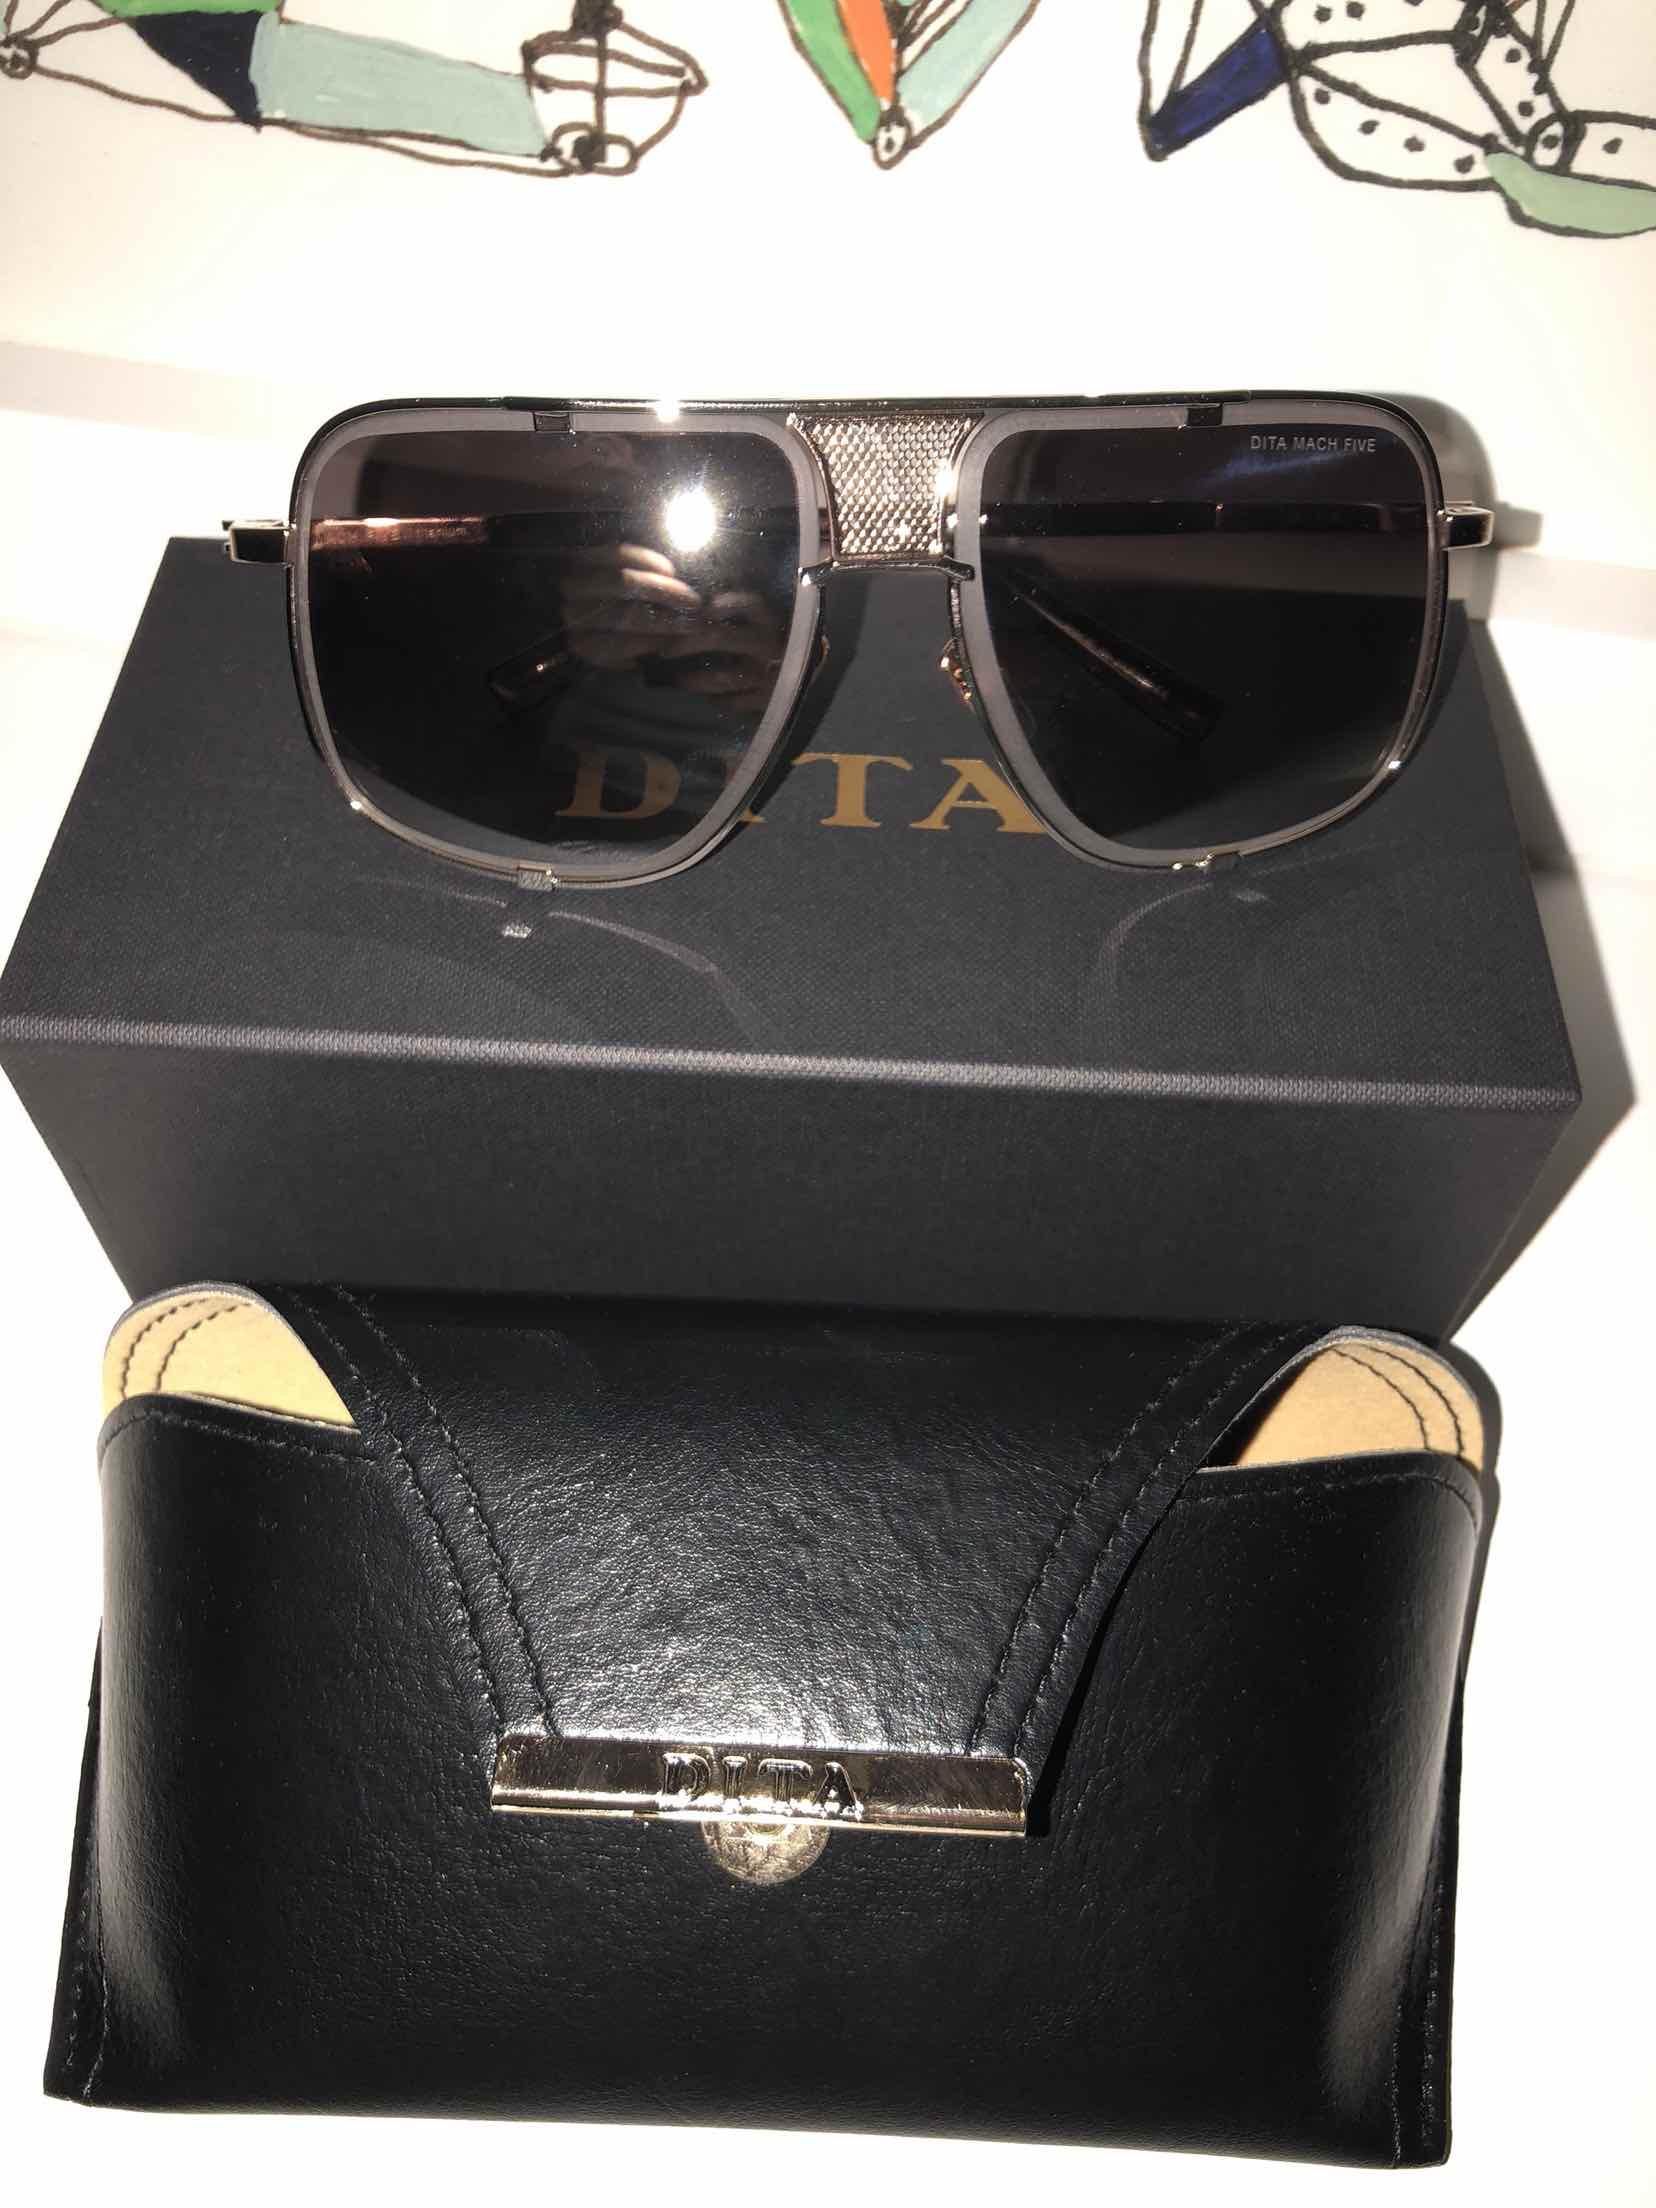 57c0c9f3f5 Dita Mach-Five Sunglasses Sale – Hamarini 2